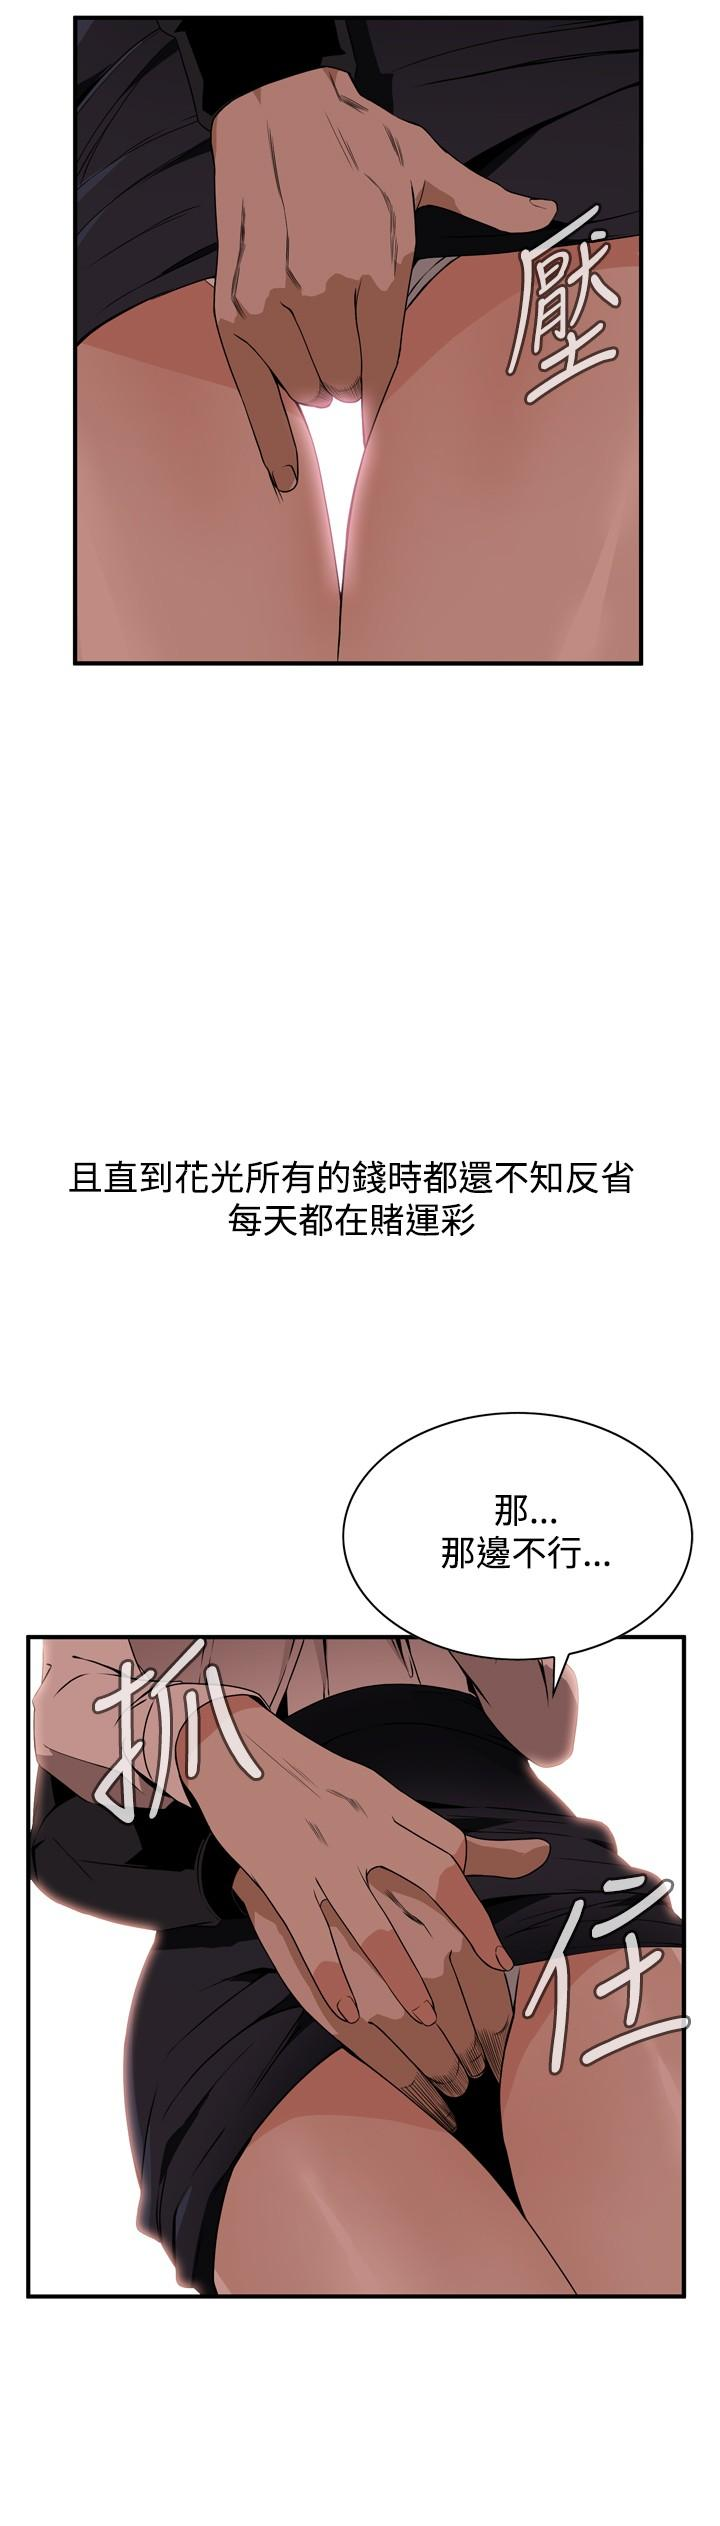 Take a Peek 偷窥 Ch.39~55 [Chinese]中文 38